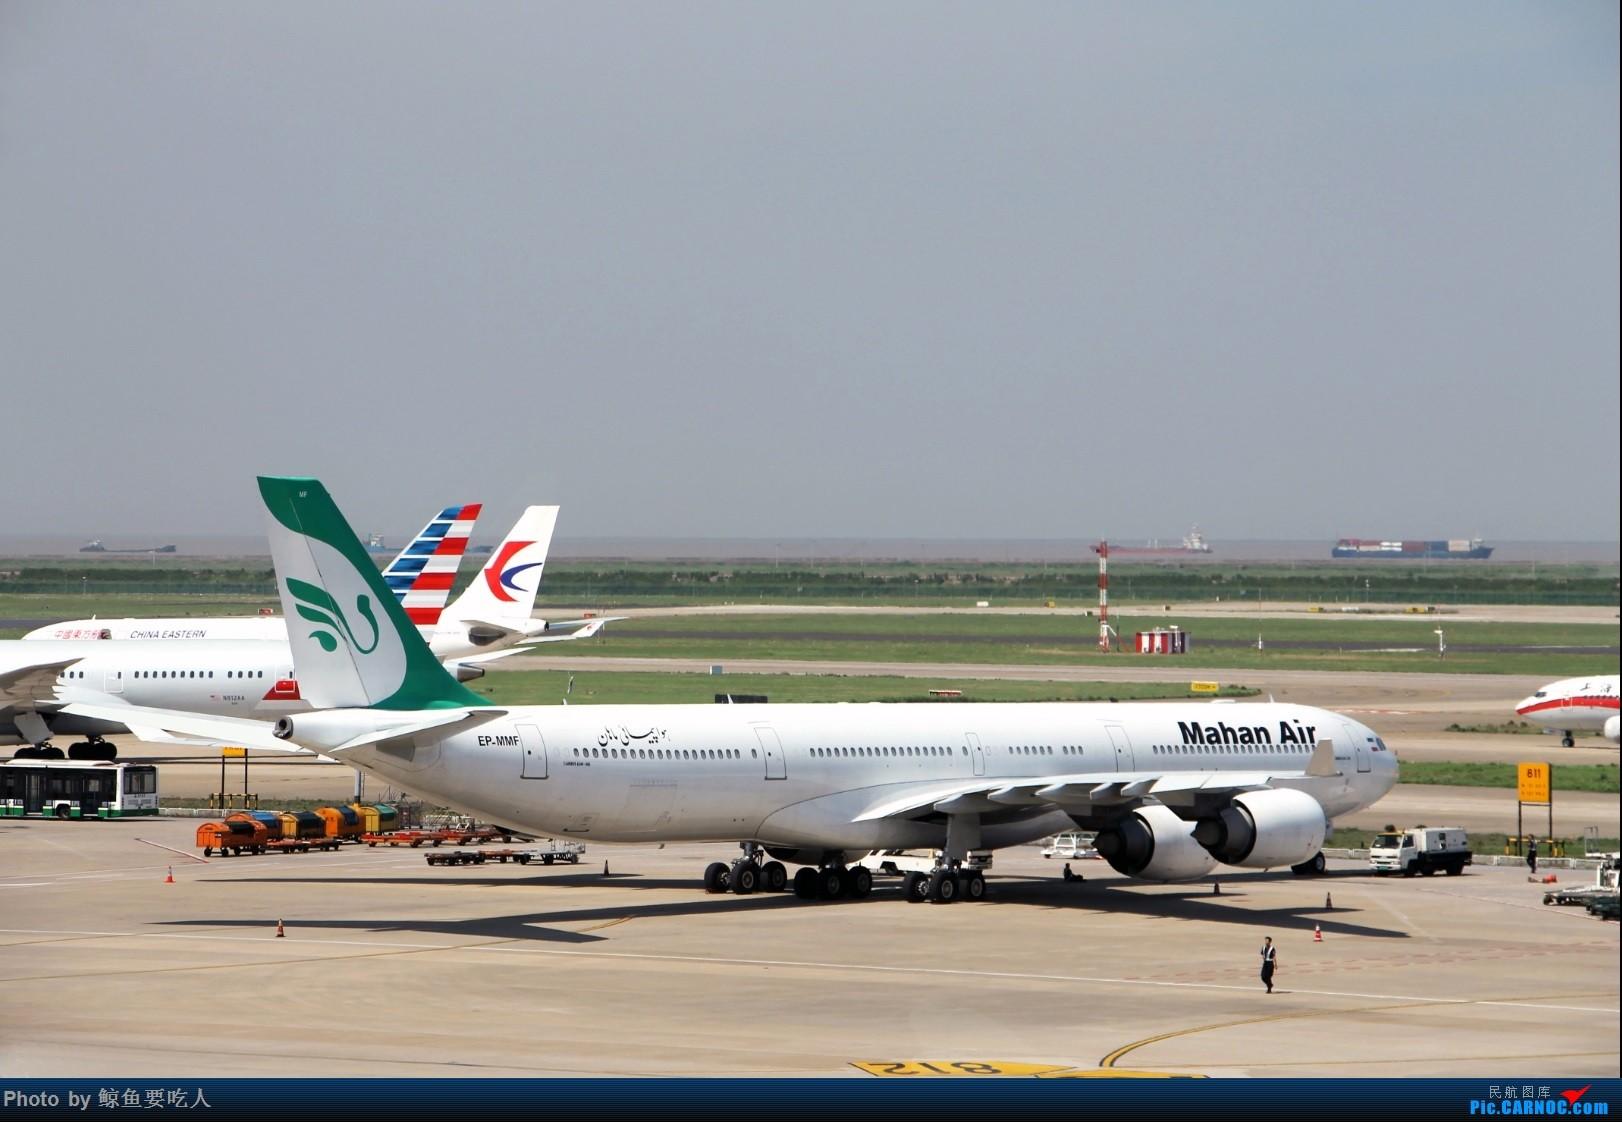 Re:[原创]暑期加拿大西部 交换学习四周 AC026 上海PVG--温哥华YVR B789初体验 经济舱客机餐食、设备一览,外加浦东众多外航客机 AIRBUS A340-600